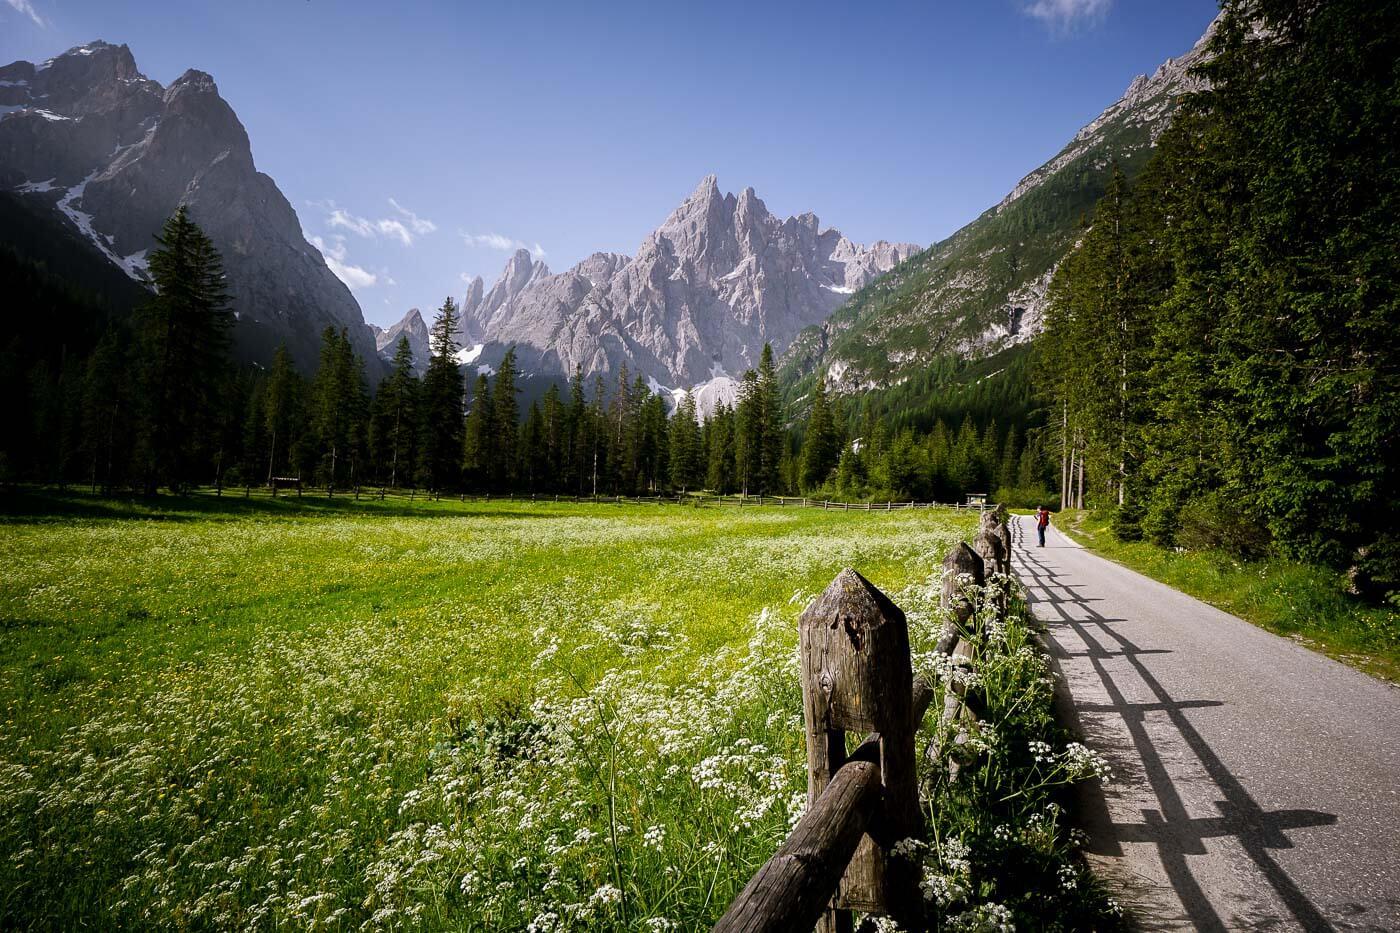 Val Fiscalina / Fischleintal, Sesto/Sexten Sundial, Dolomites